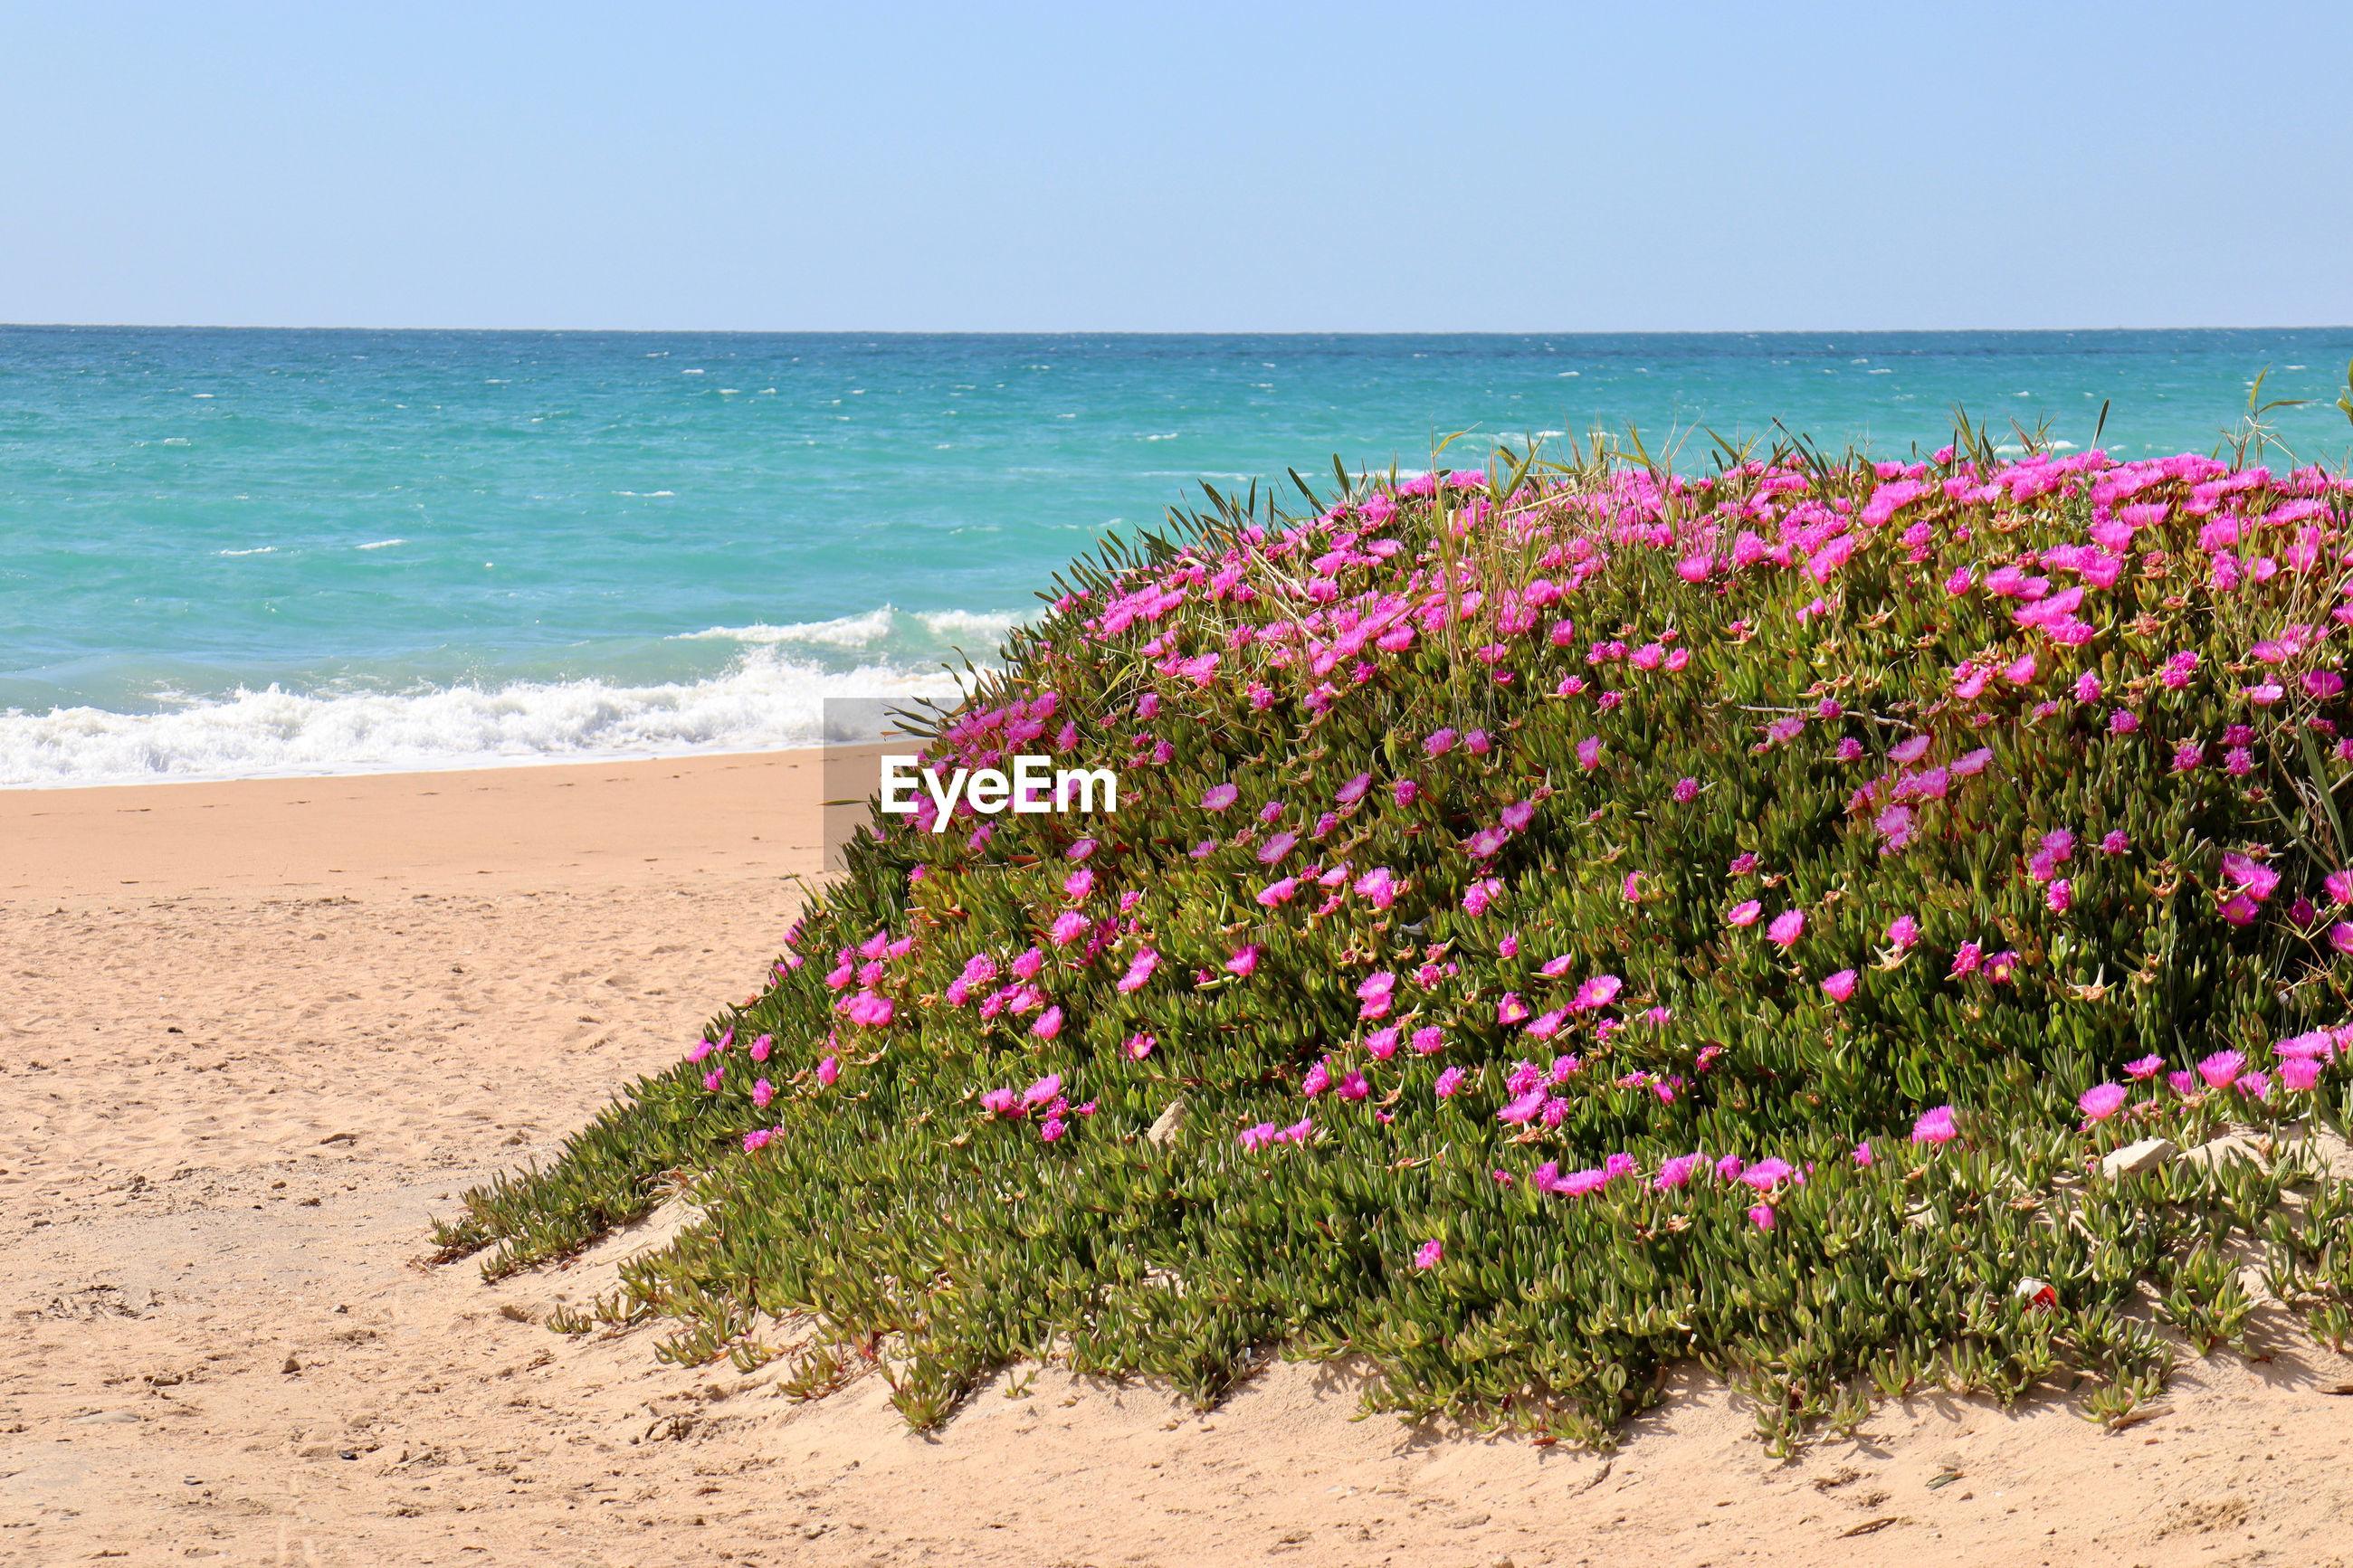 PINK FLOWERS ON BEACH AGAINST SEA